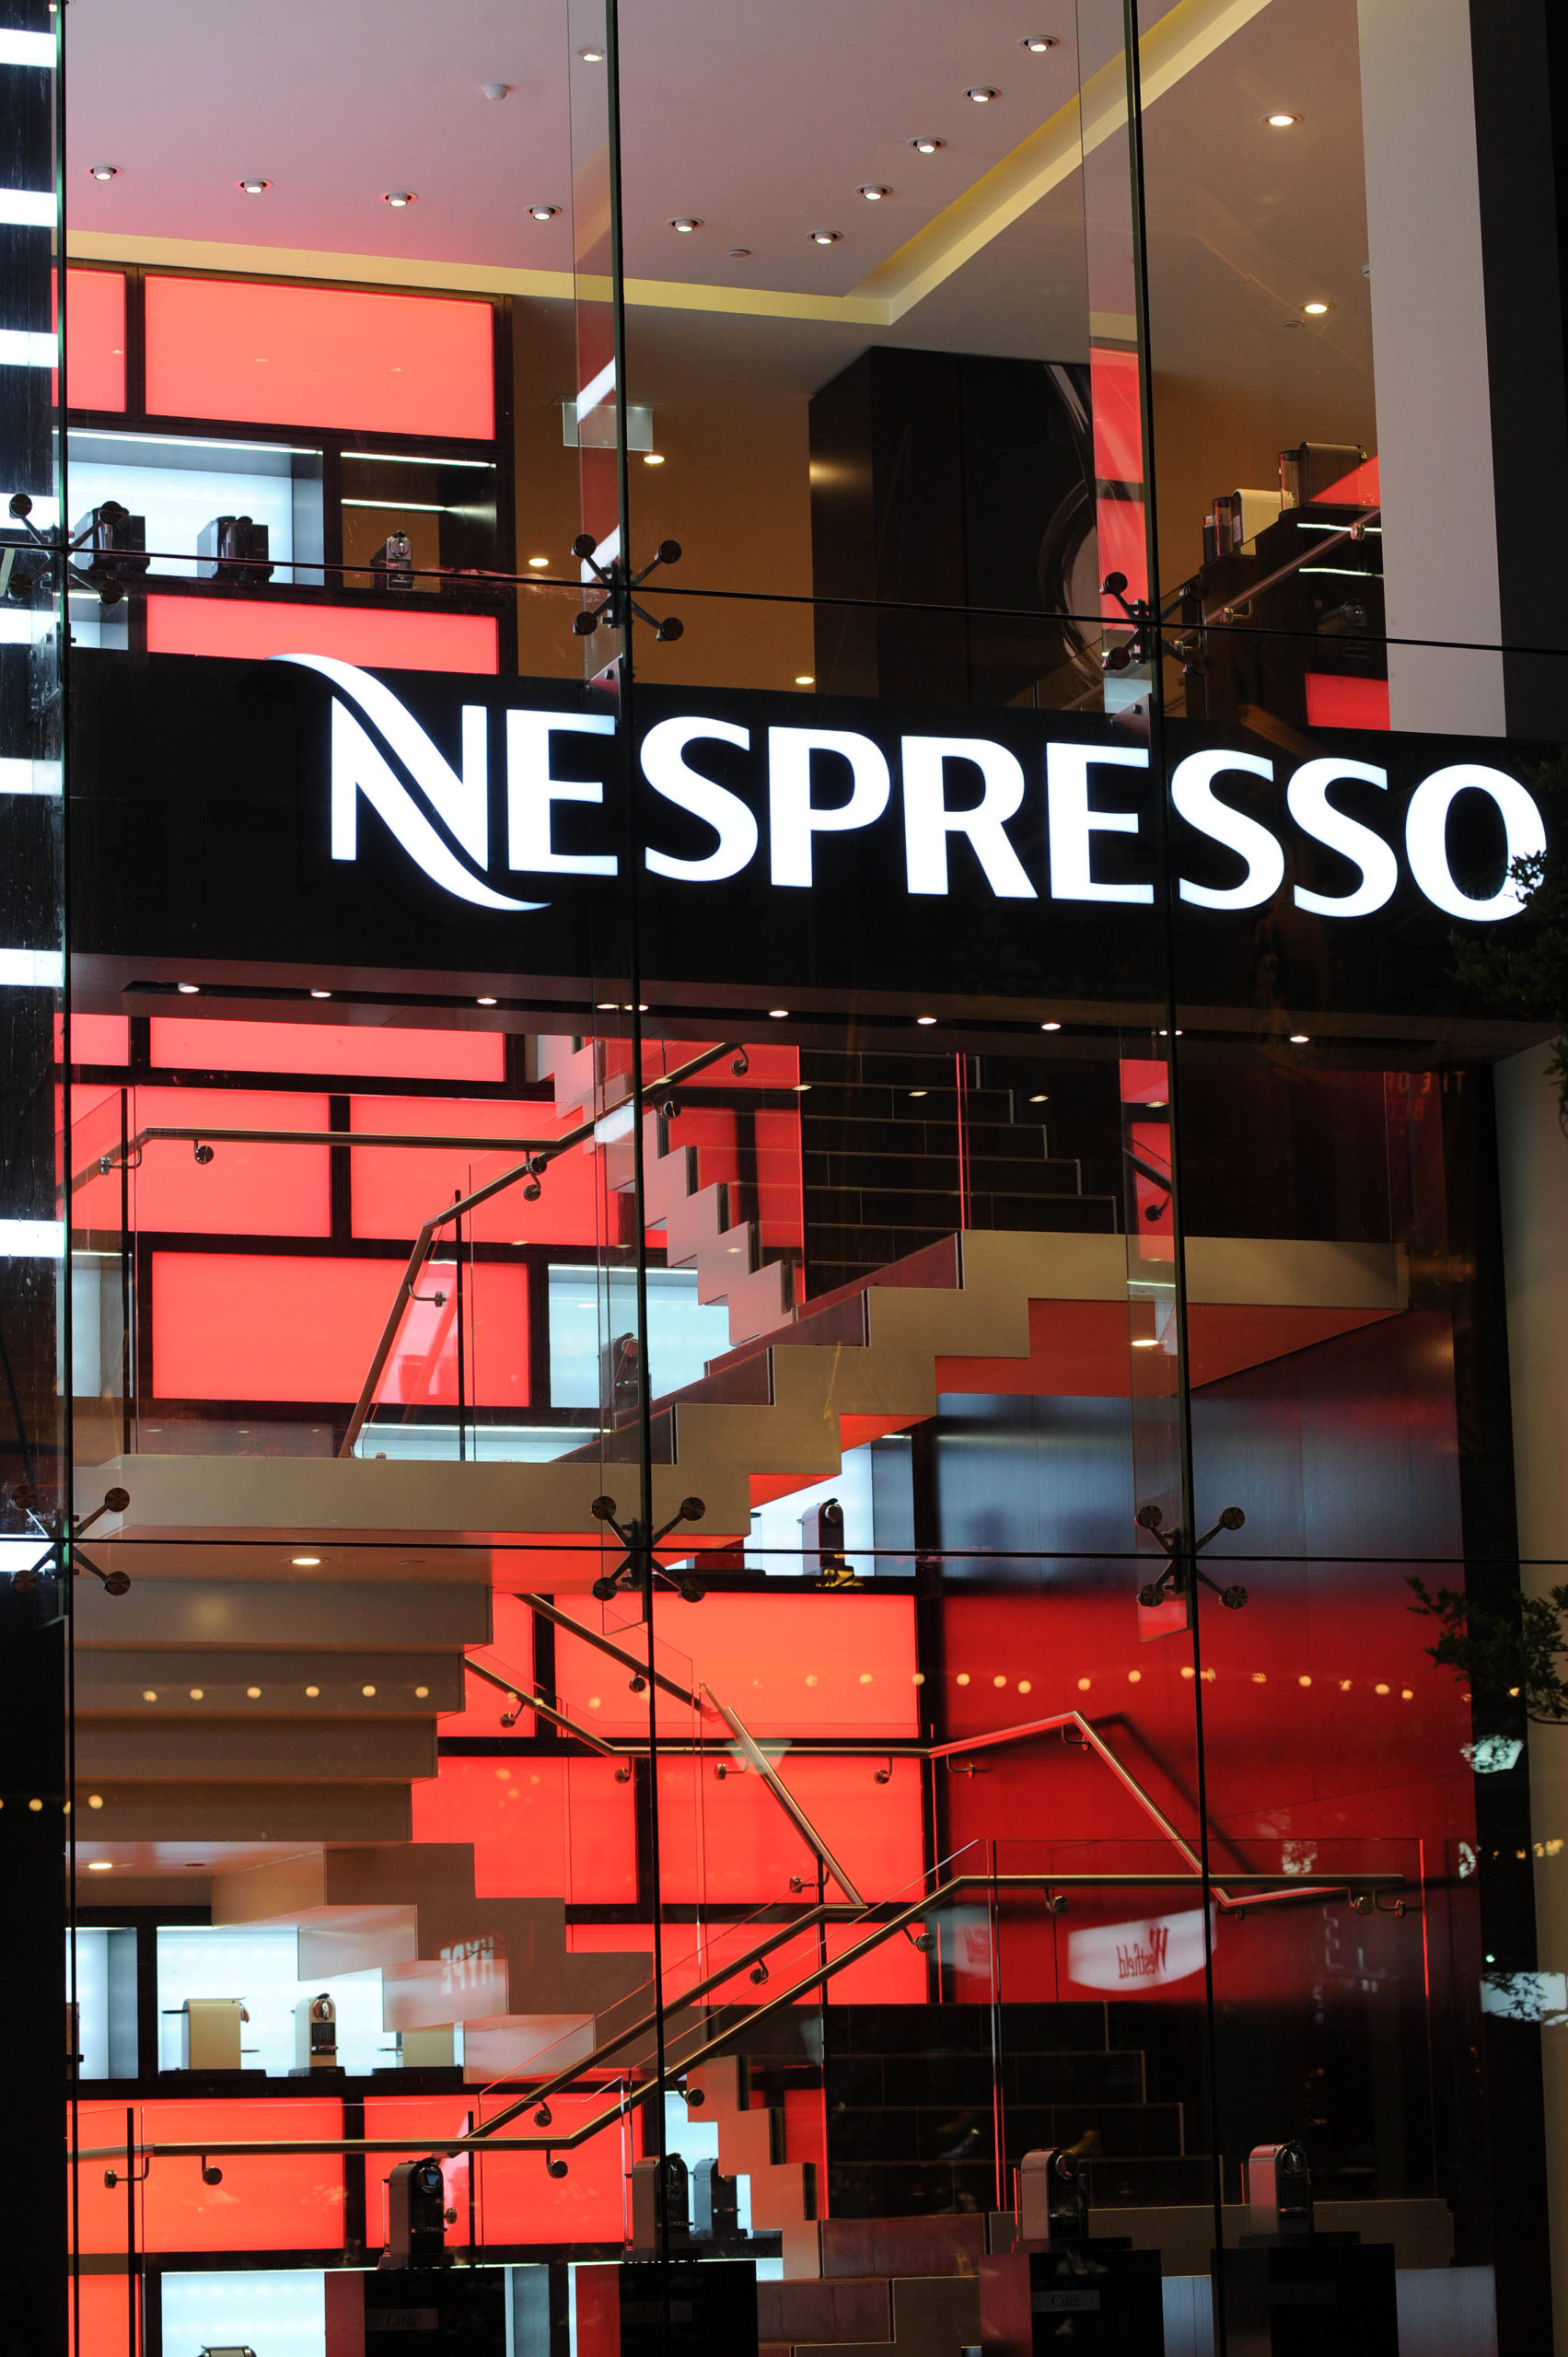 nespresso、ネスプレッソ、トップ